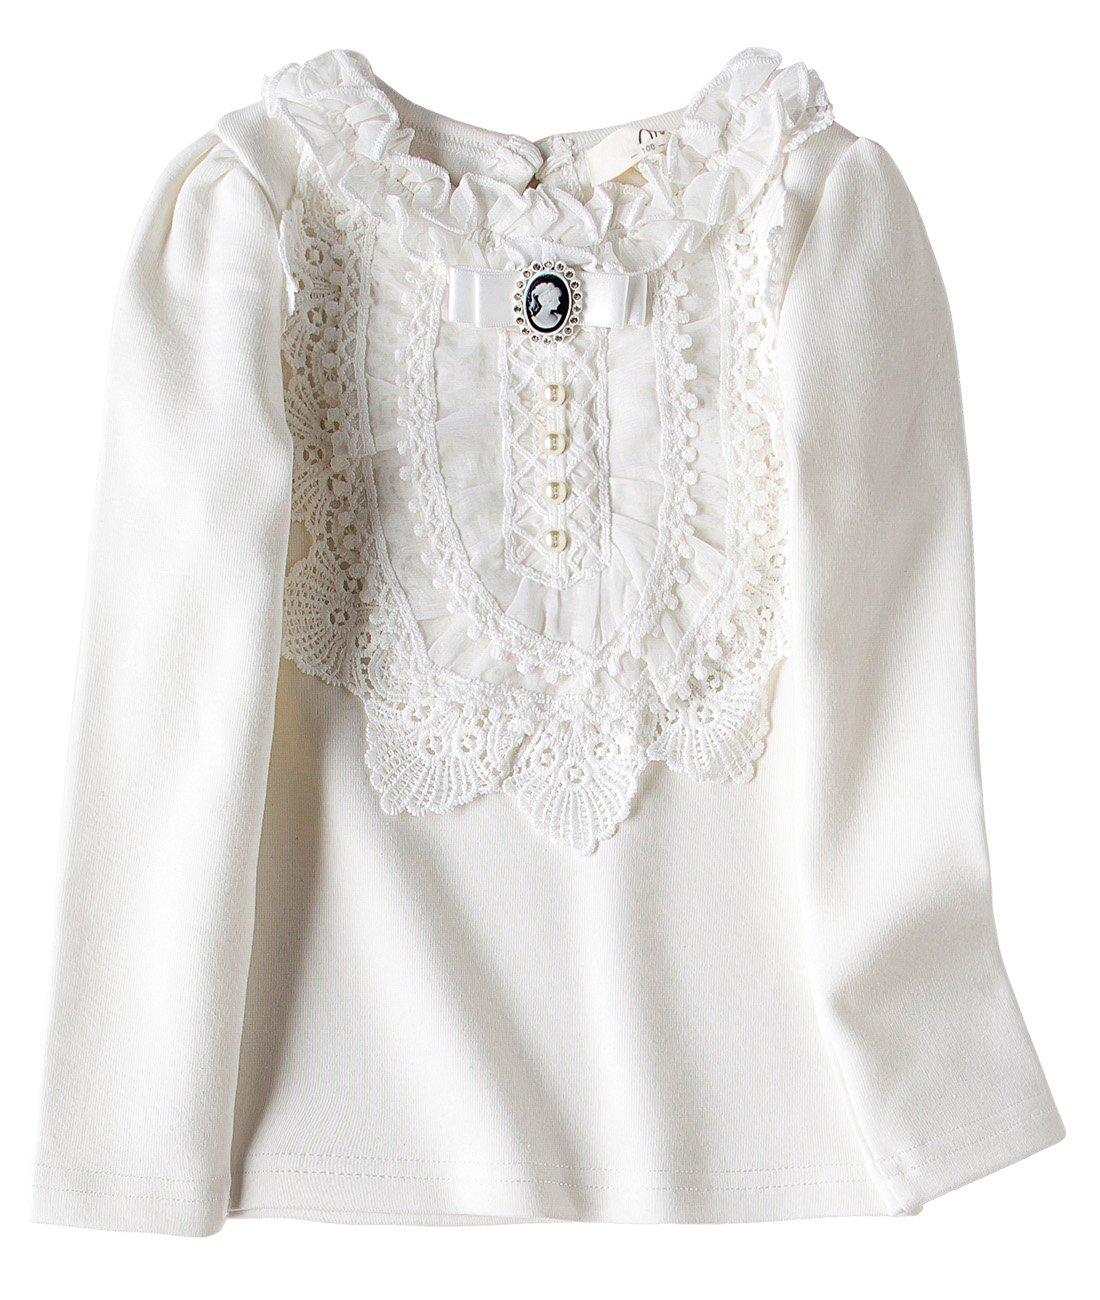 VYU Little Girls Long Sleeve Flower Blouse 2-8 Year Kids Autumn Cotton Lace Tops